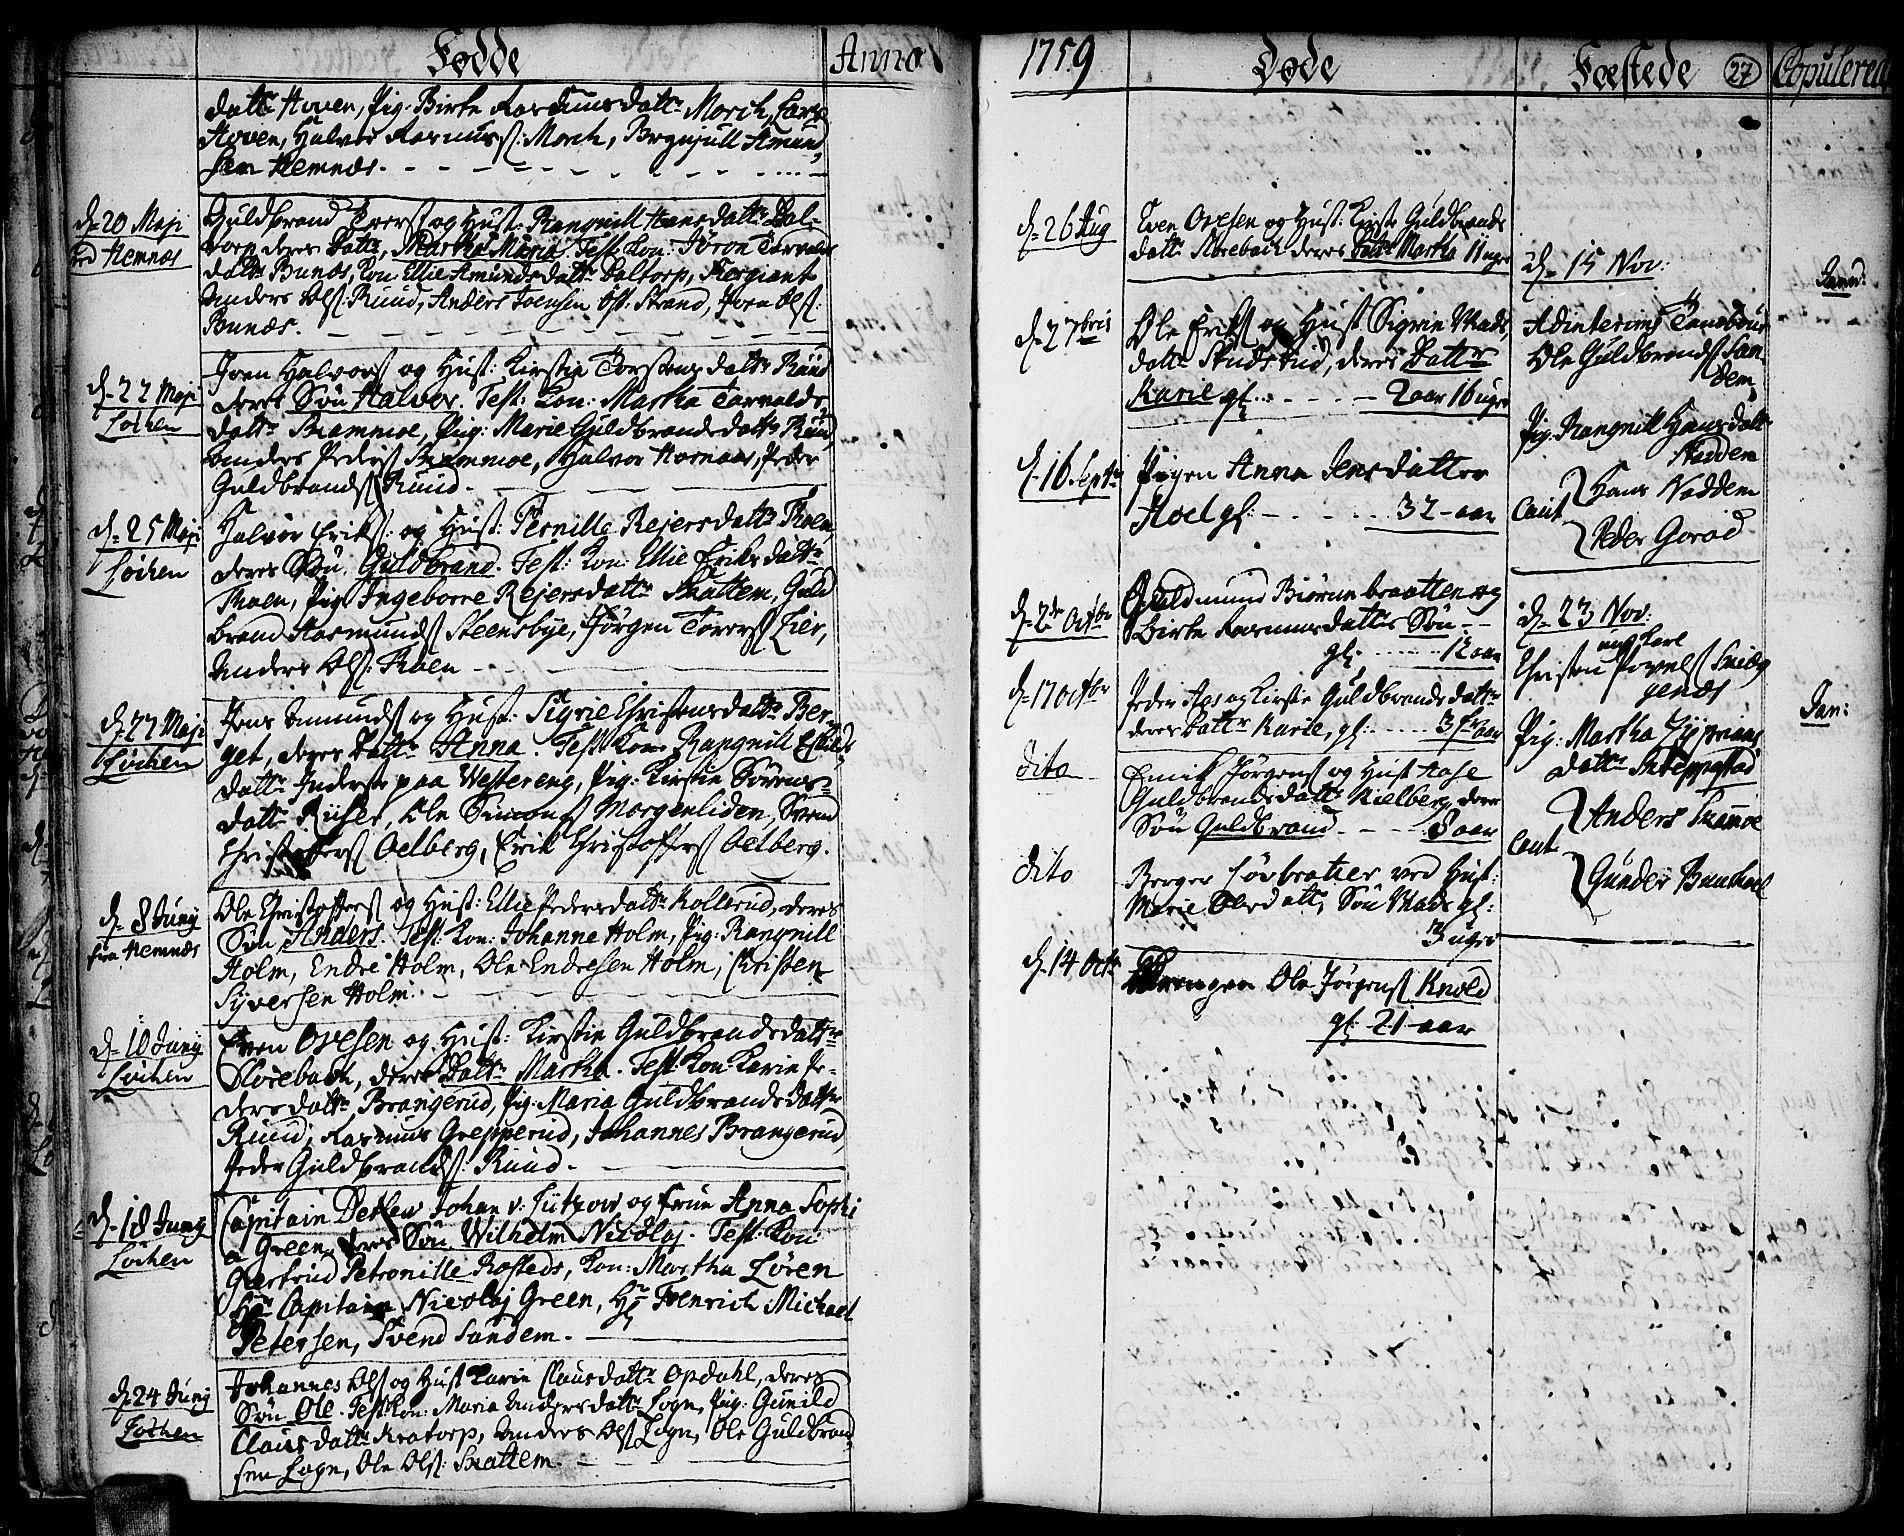 SAO, Høland prestekontor Kirkebøker, F/Fa/L0004: Ministerialbok nr. I 4, 1757-1780, s. 27